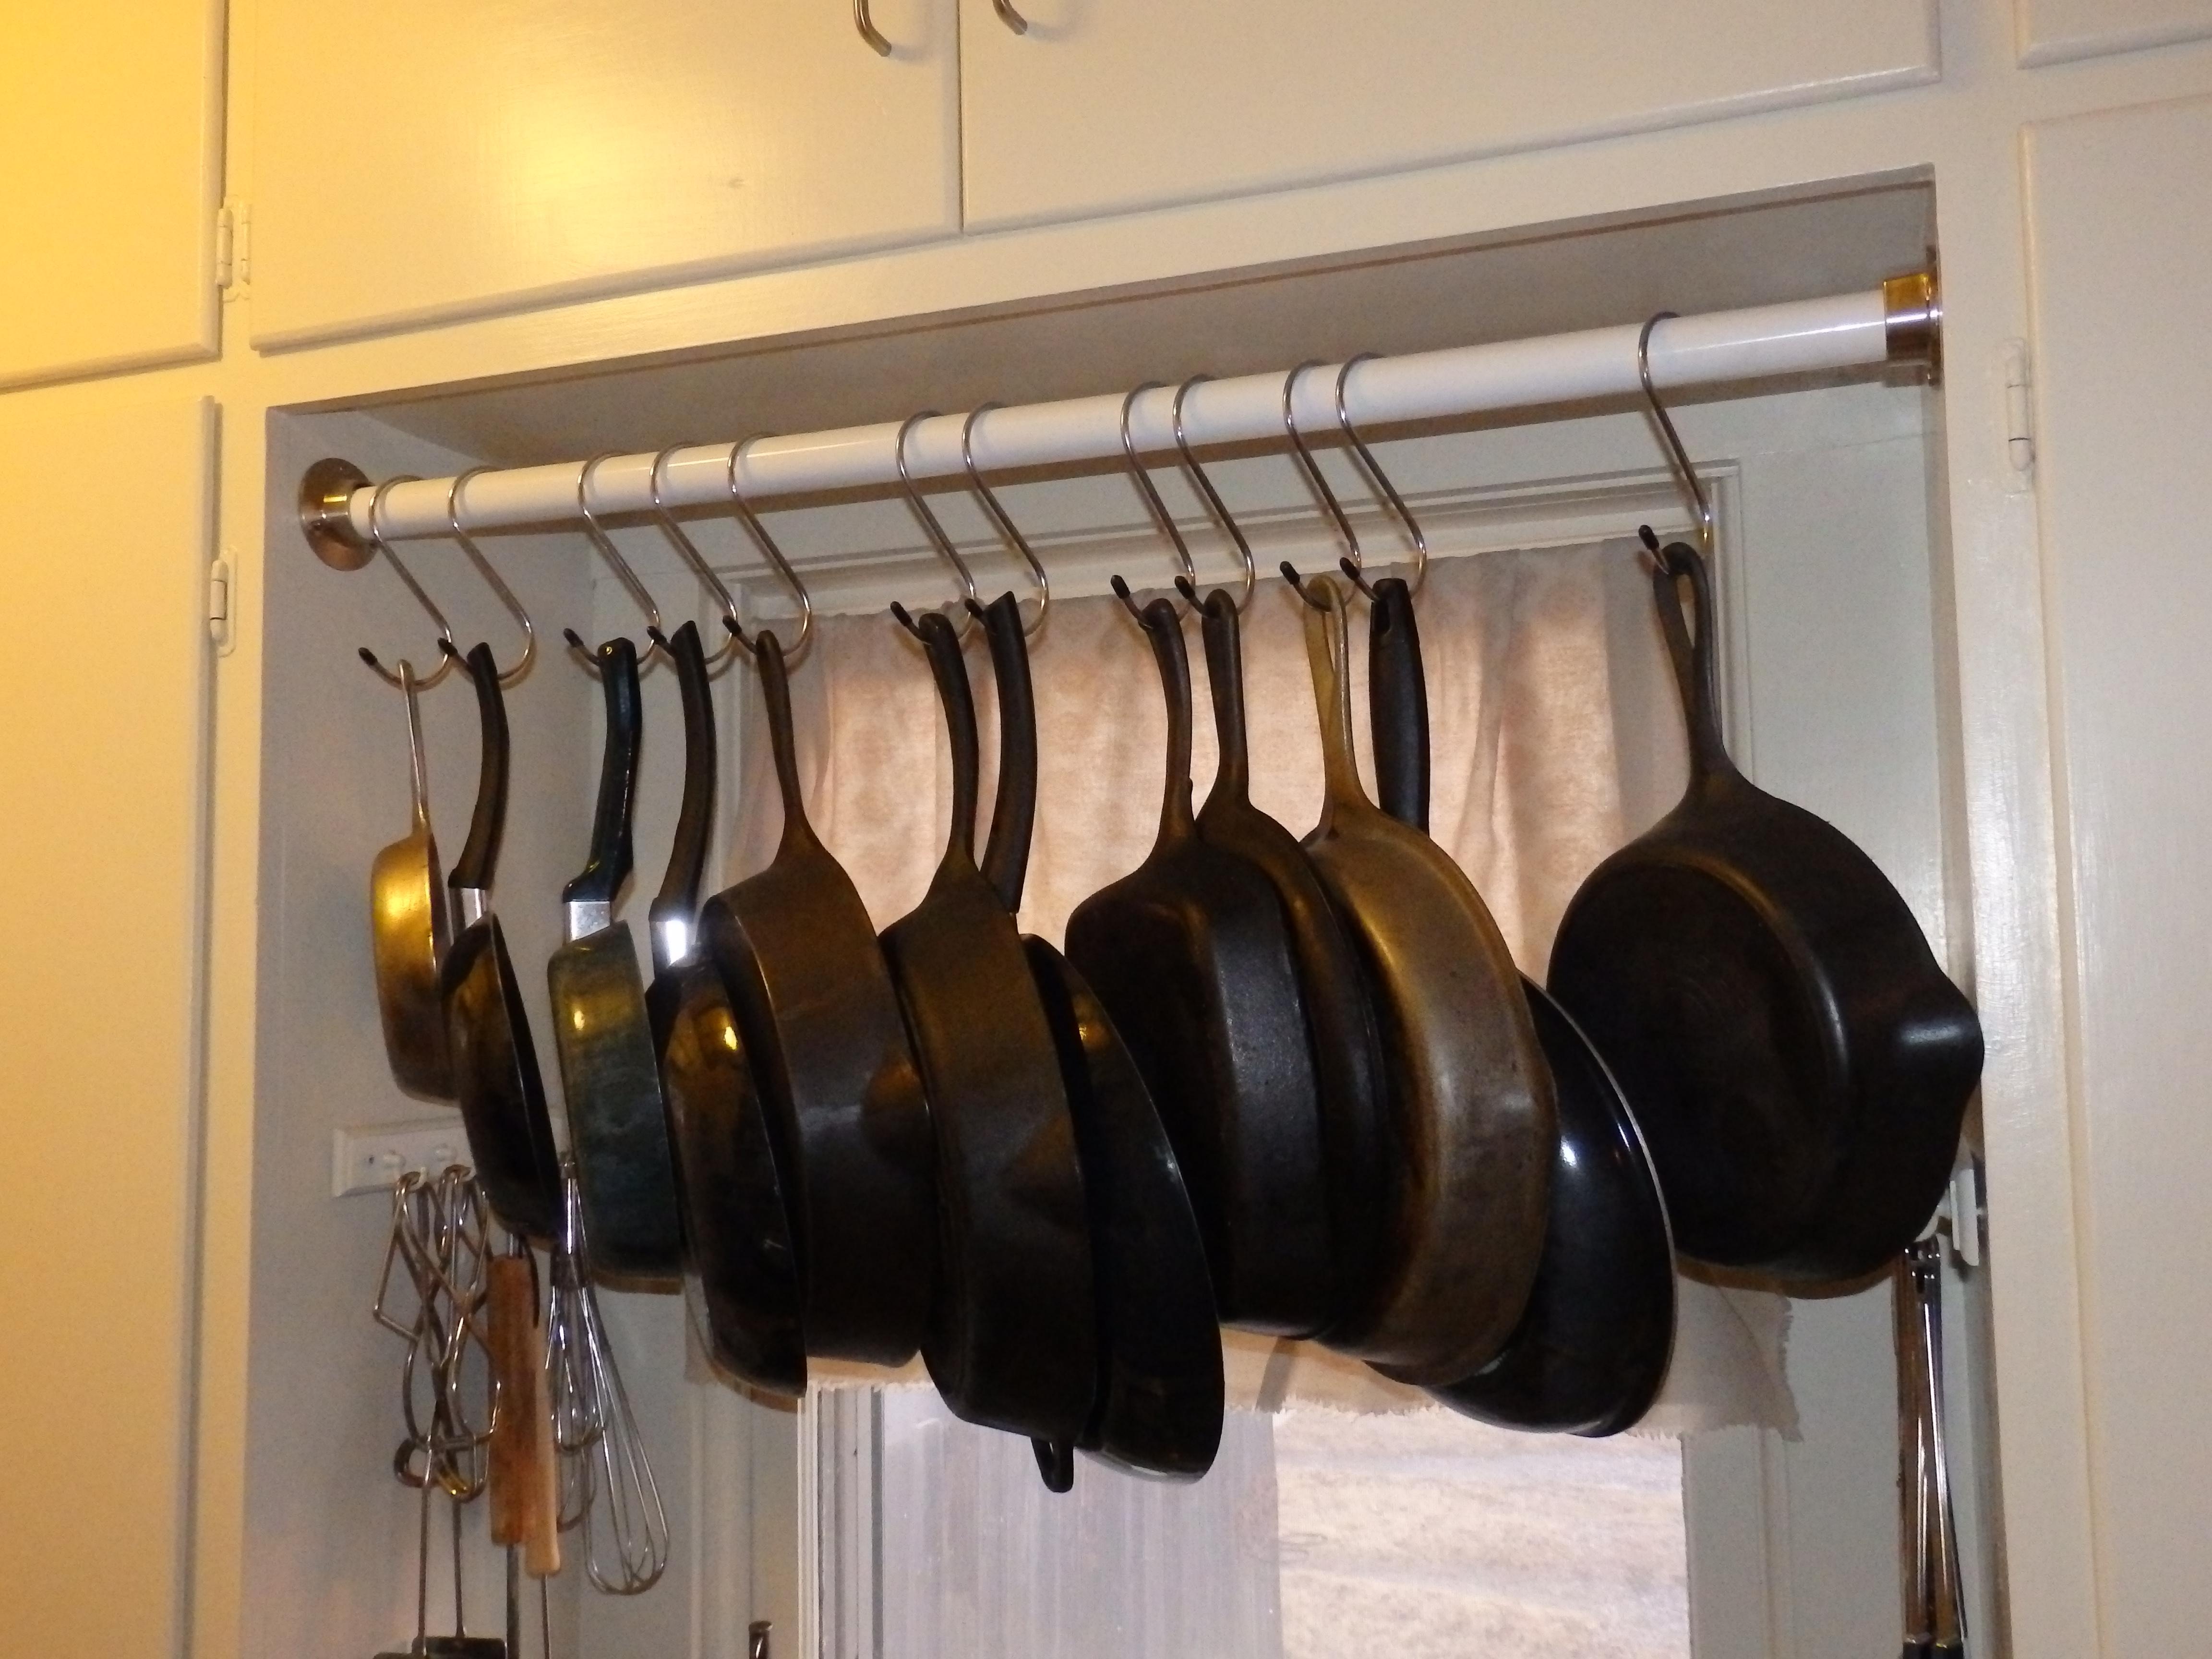 diy closet rod. Kitchen Skillet Rack Diy Closet Rod